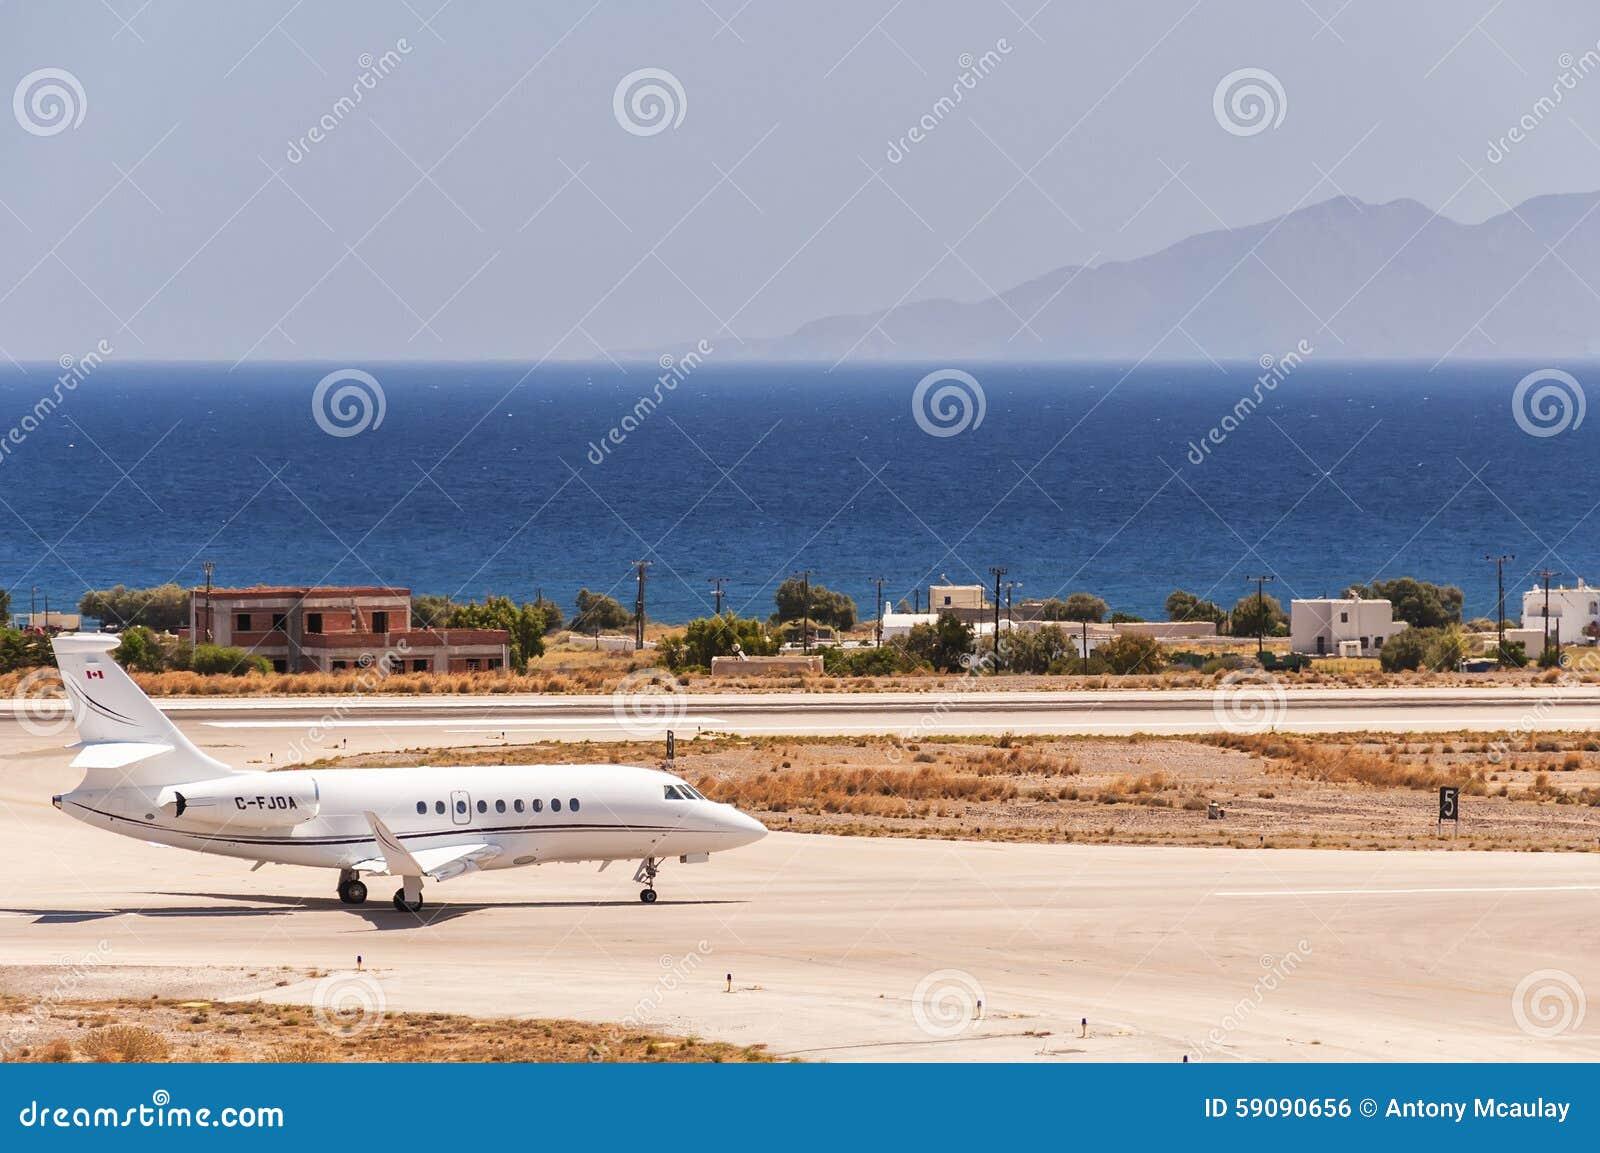 Santorini Departure Private Jet Editorial Photo  Image 59090656